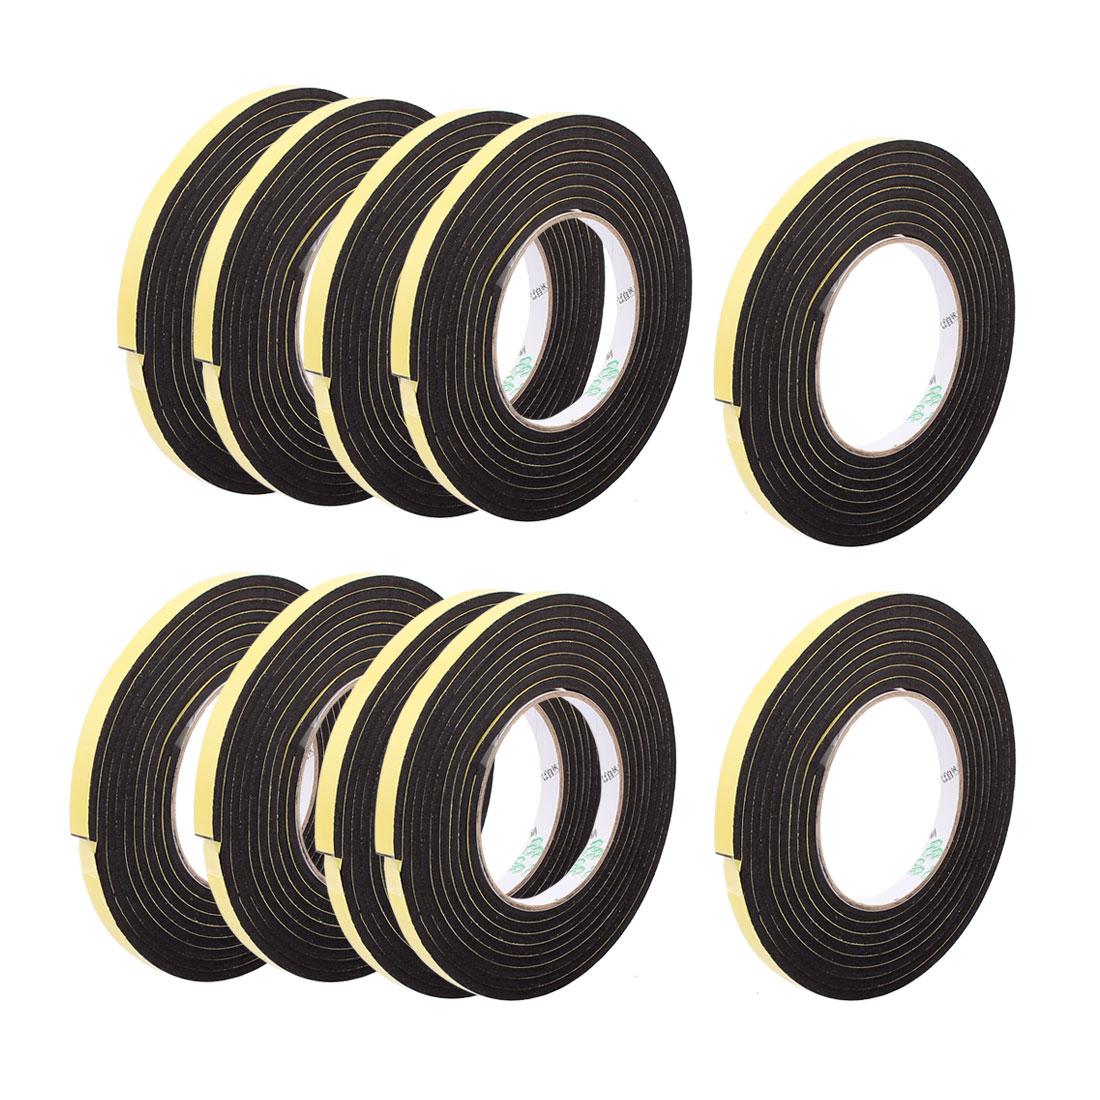 10Pcs 1CM Width 3 Meters Length 4MM Thick Single Sided Sealing Shockproof Sponge Tape